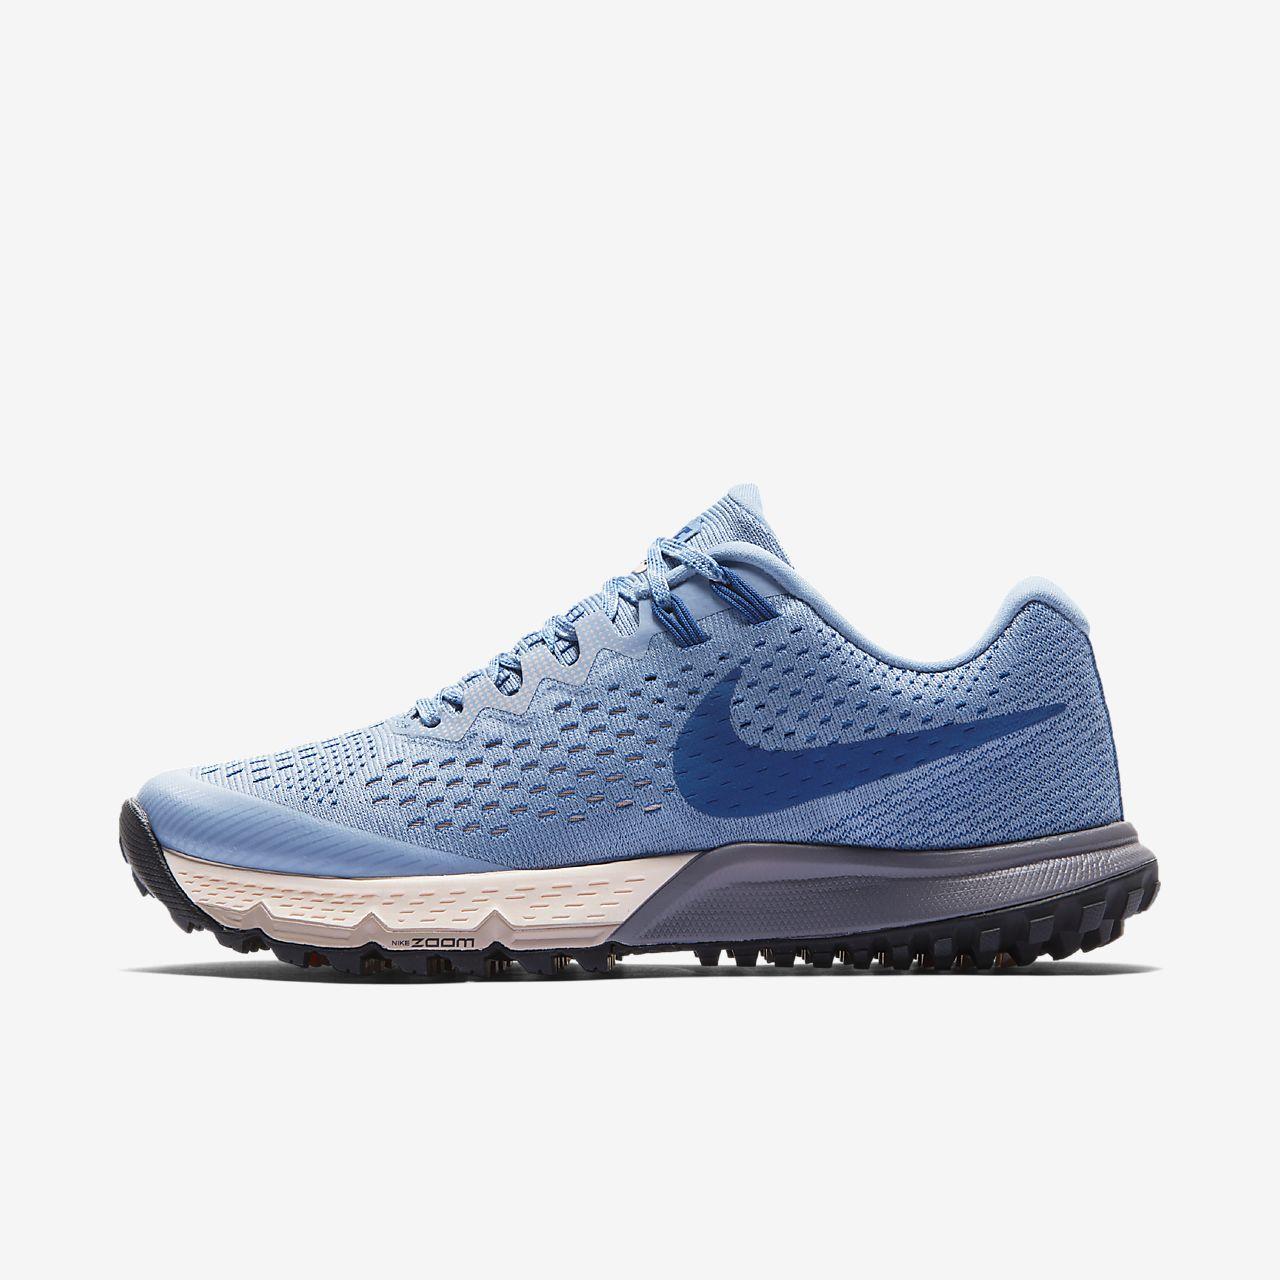 hot sales fd793 dd44f ... Damskie buty do biegania Nike Air Zoom Terra Kiger 4